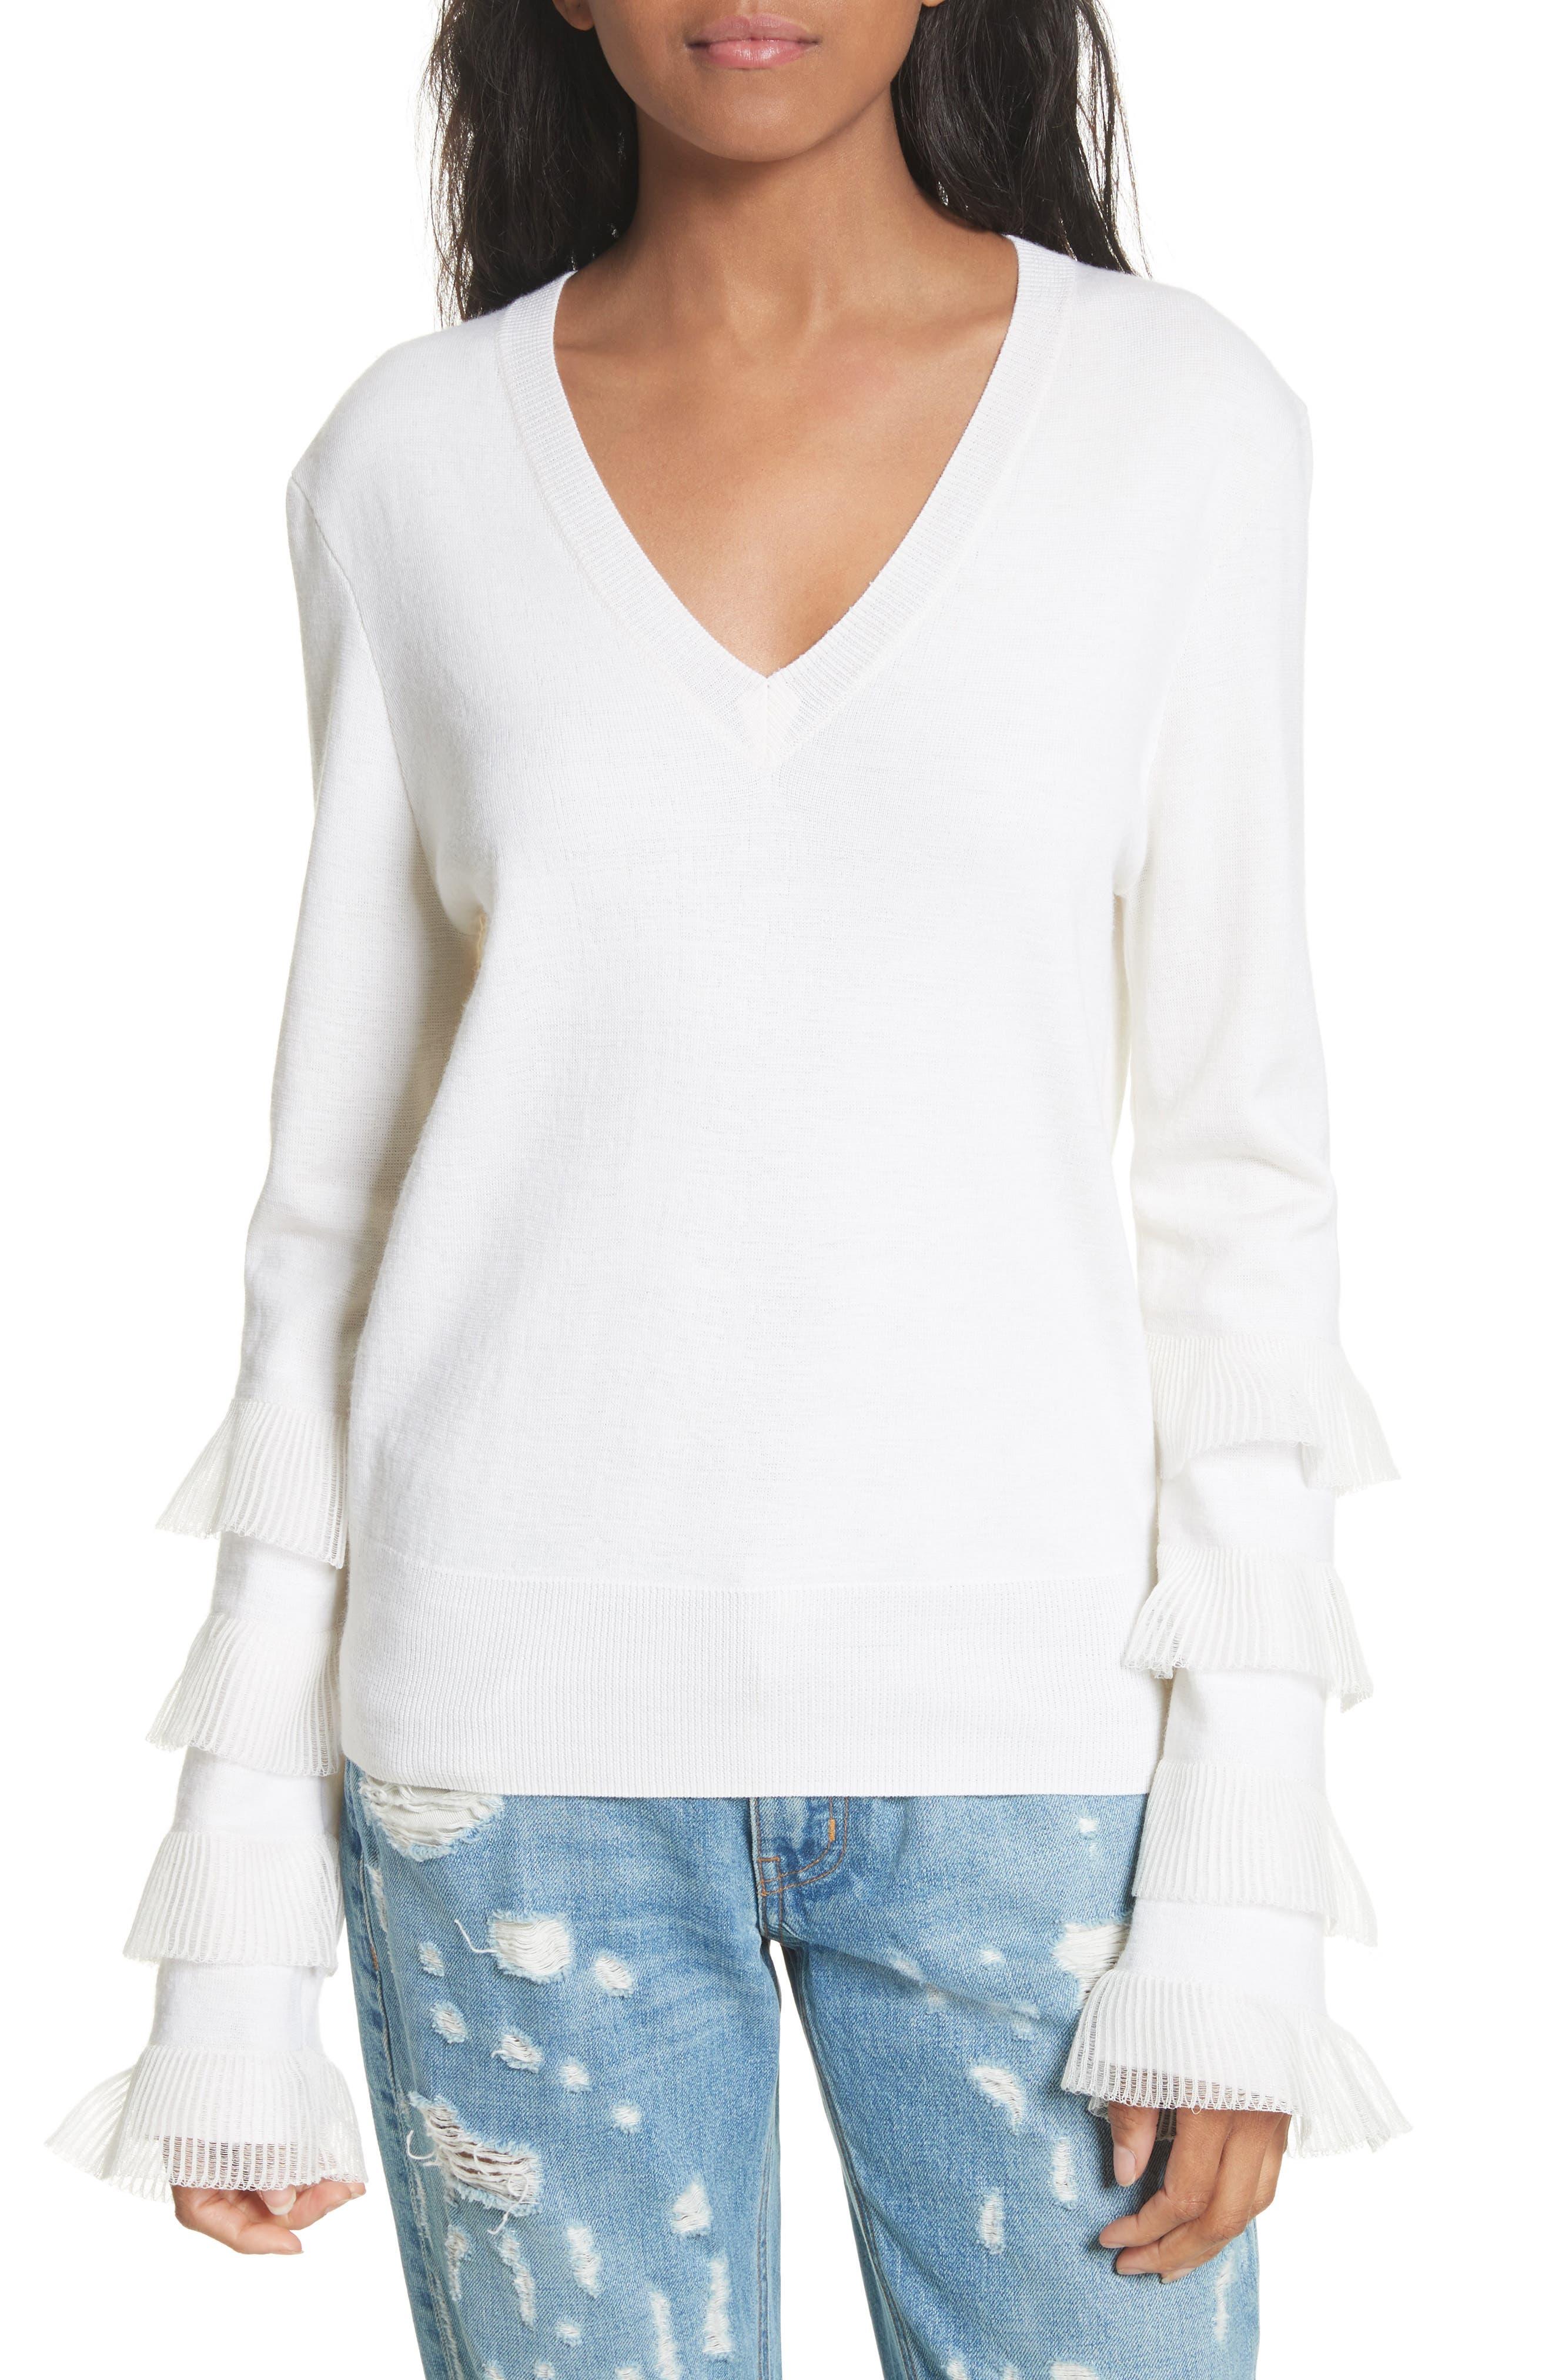 Derek Lam 10 Crosby Tiered Ruffle Sleeve Sweater